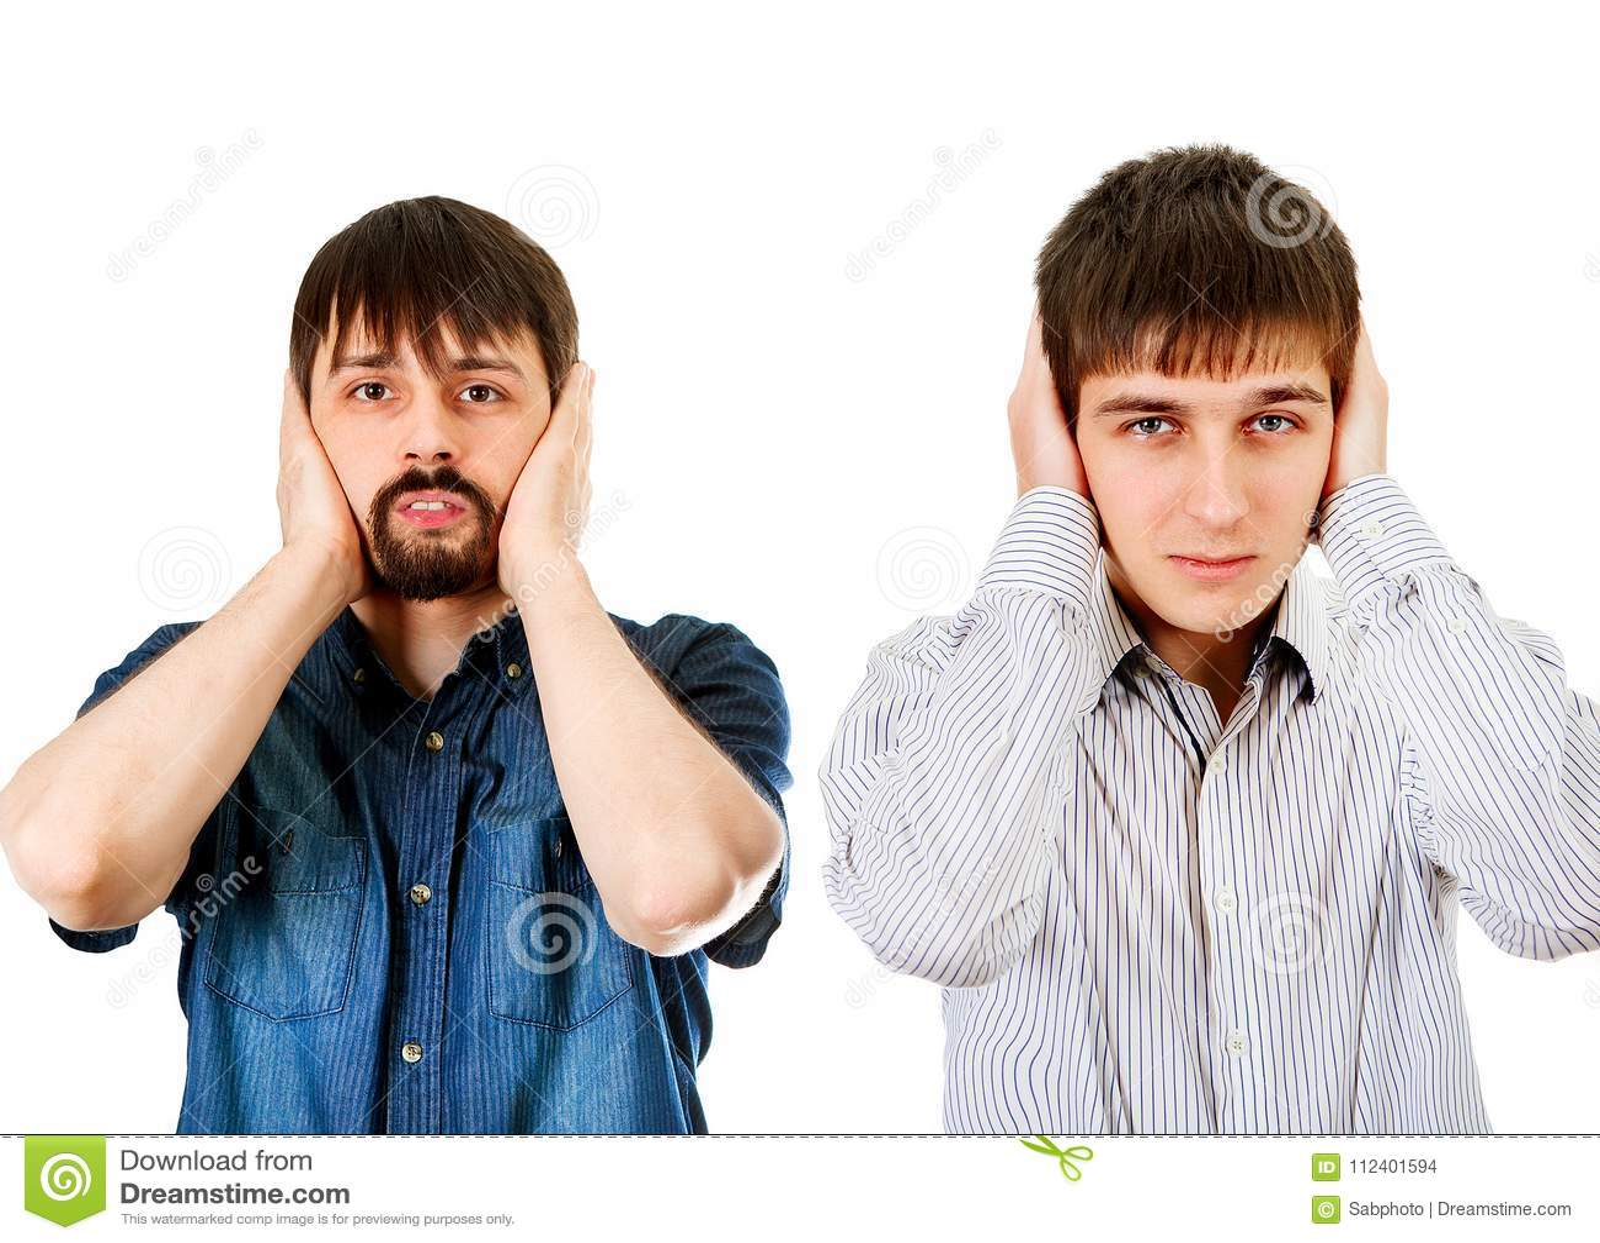 Guys close the Ears